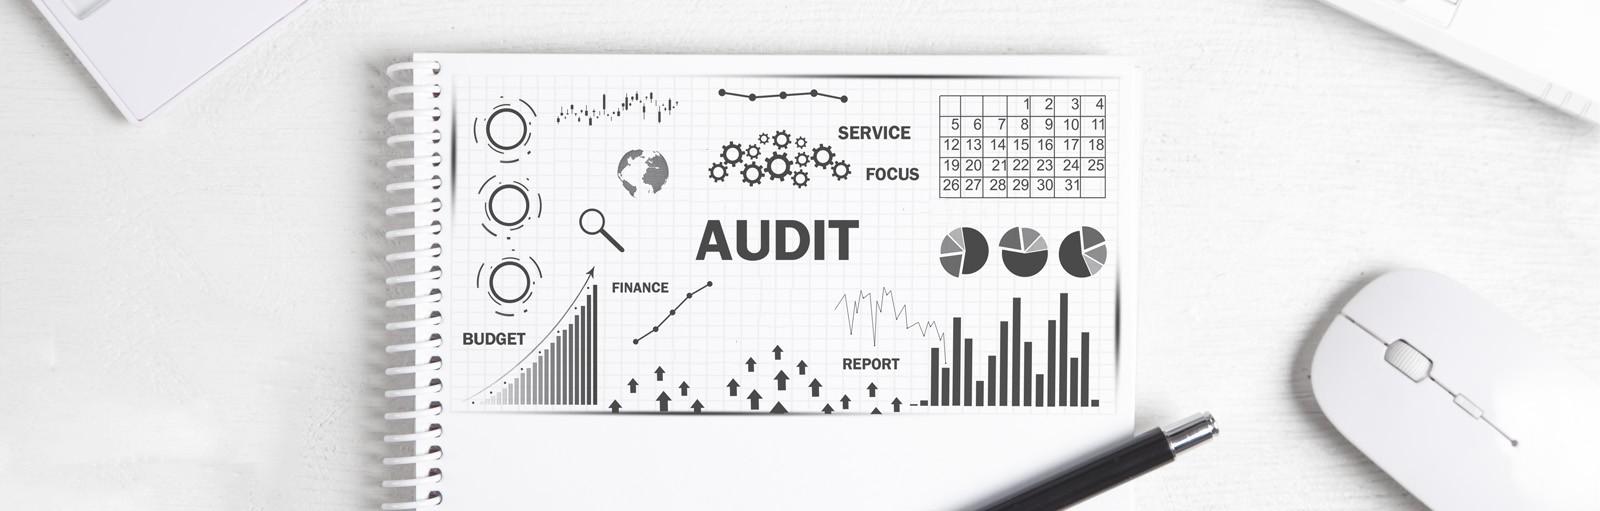 Audit rétro-prospectif conseils LocalNova